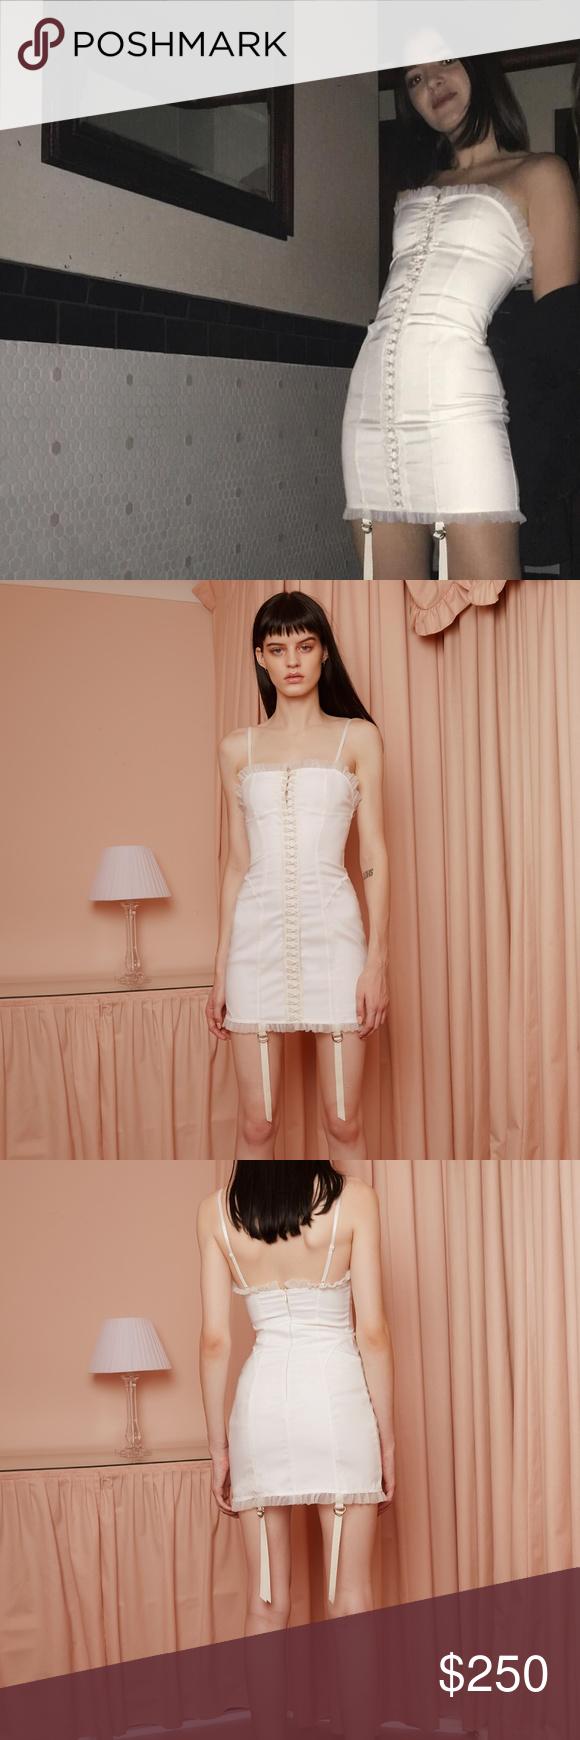 Daisy Daisy TV Satin Sculpt Dress - XS NWOT Never worn f65e1741e